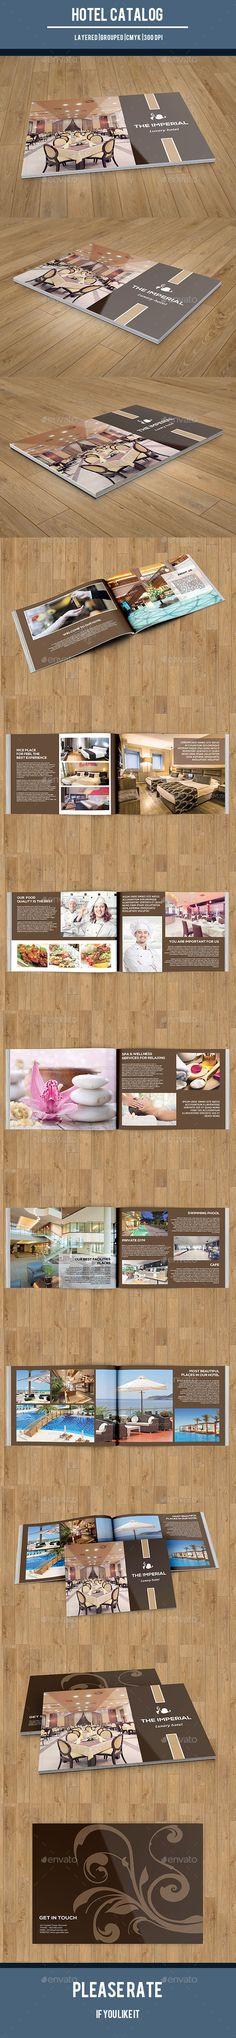 Hotel Business Catalog/Brochure-V156 (CS2, 8.5x11, blue, brochure, business, business brochure, charts, clean, corporate, corporate brochure, design, elegant, graphic river, graphicriver, gray, Hotel business, icons, modern, money, motel, proposal, resort, restaurant, template, typography)